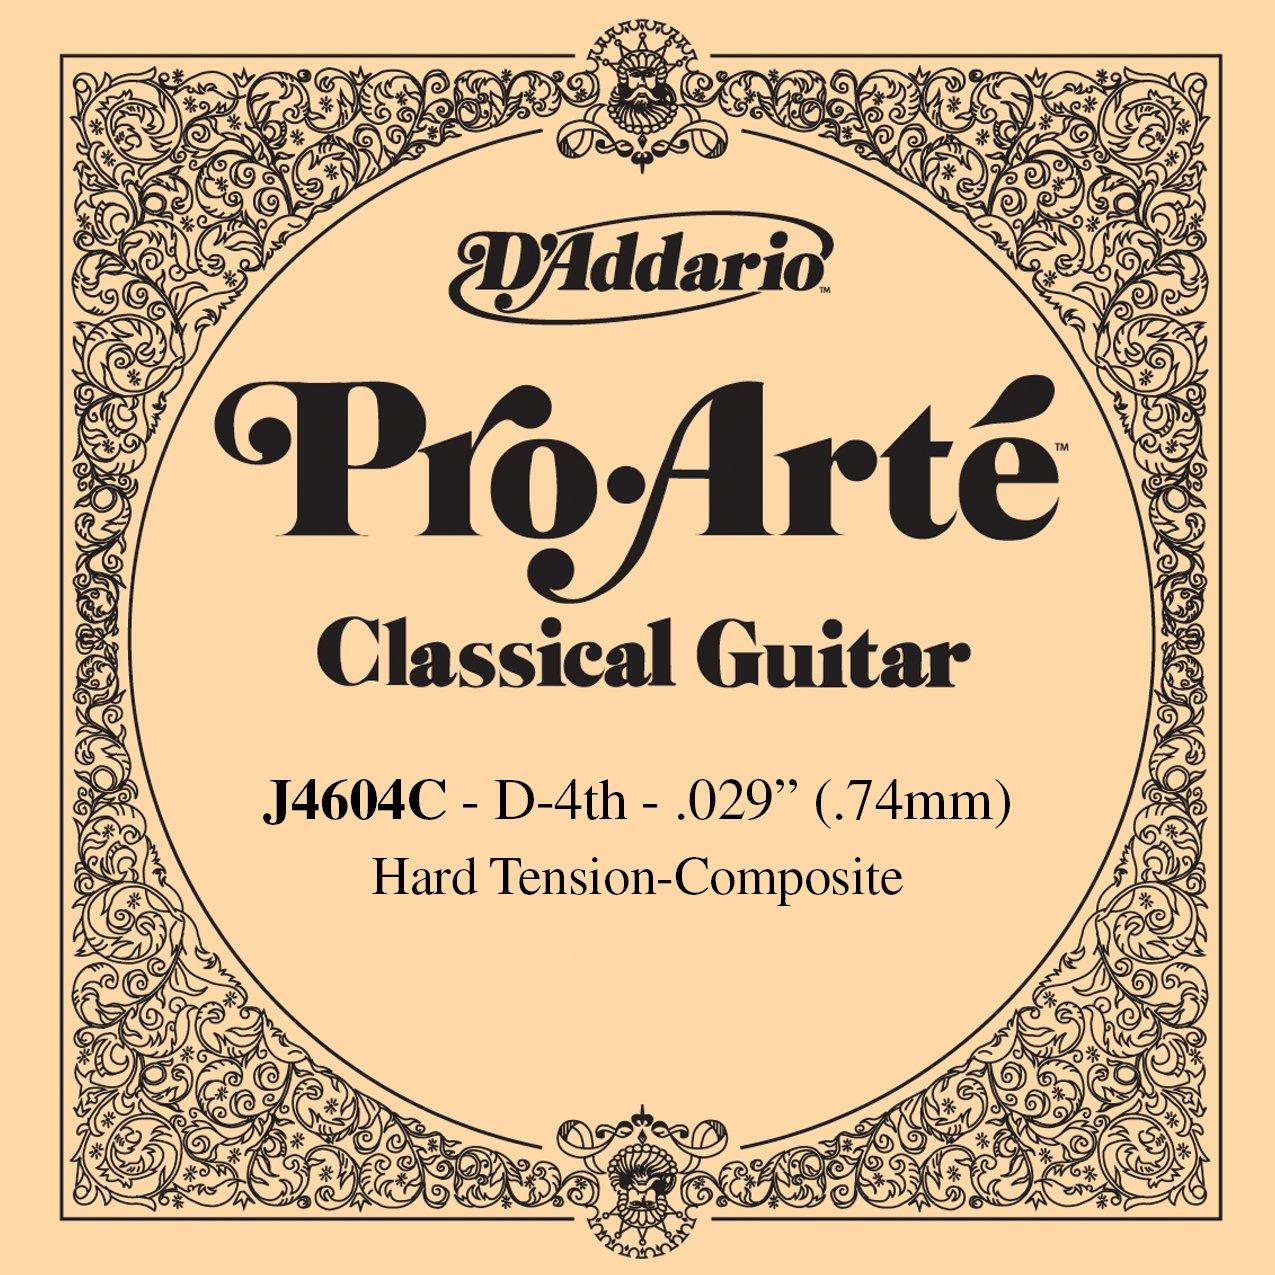 D'Addario J4604C Pro-Arte Nylon Classical Guitar Single String, Hard Tension, Fourth String D'Addario &Co. Inc